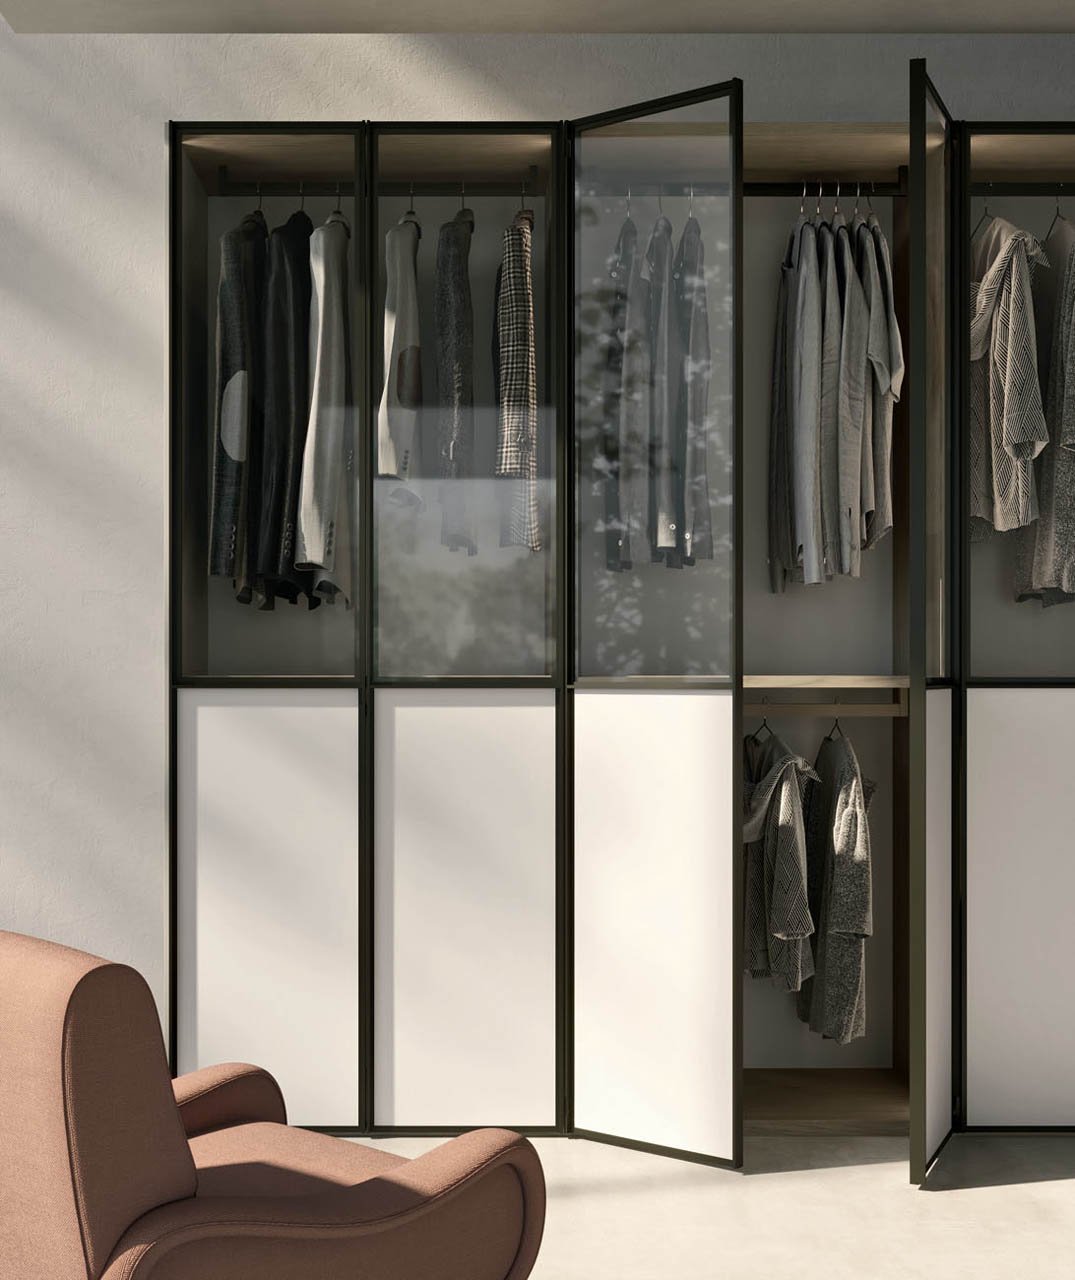 armadio-battente-anta-glass-6-orme-1092x1300